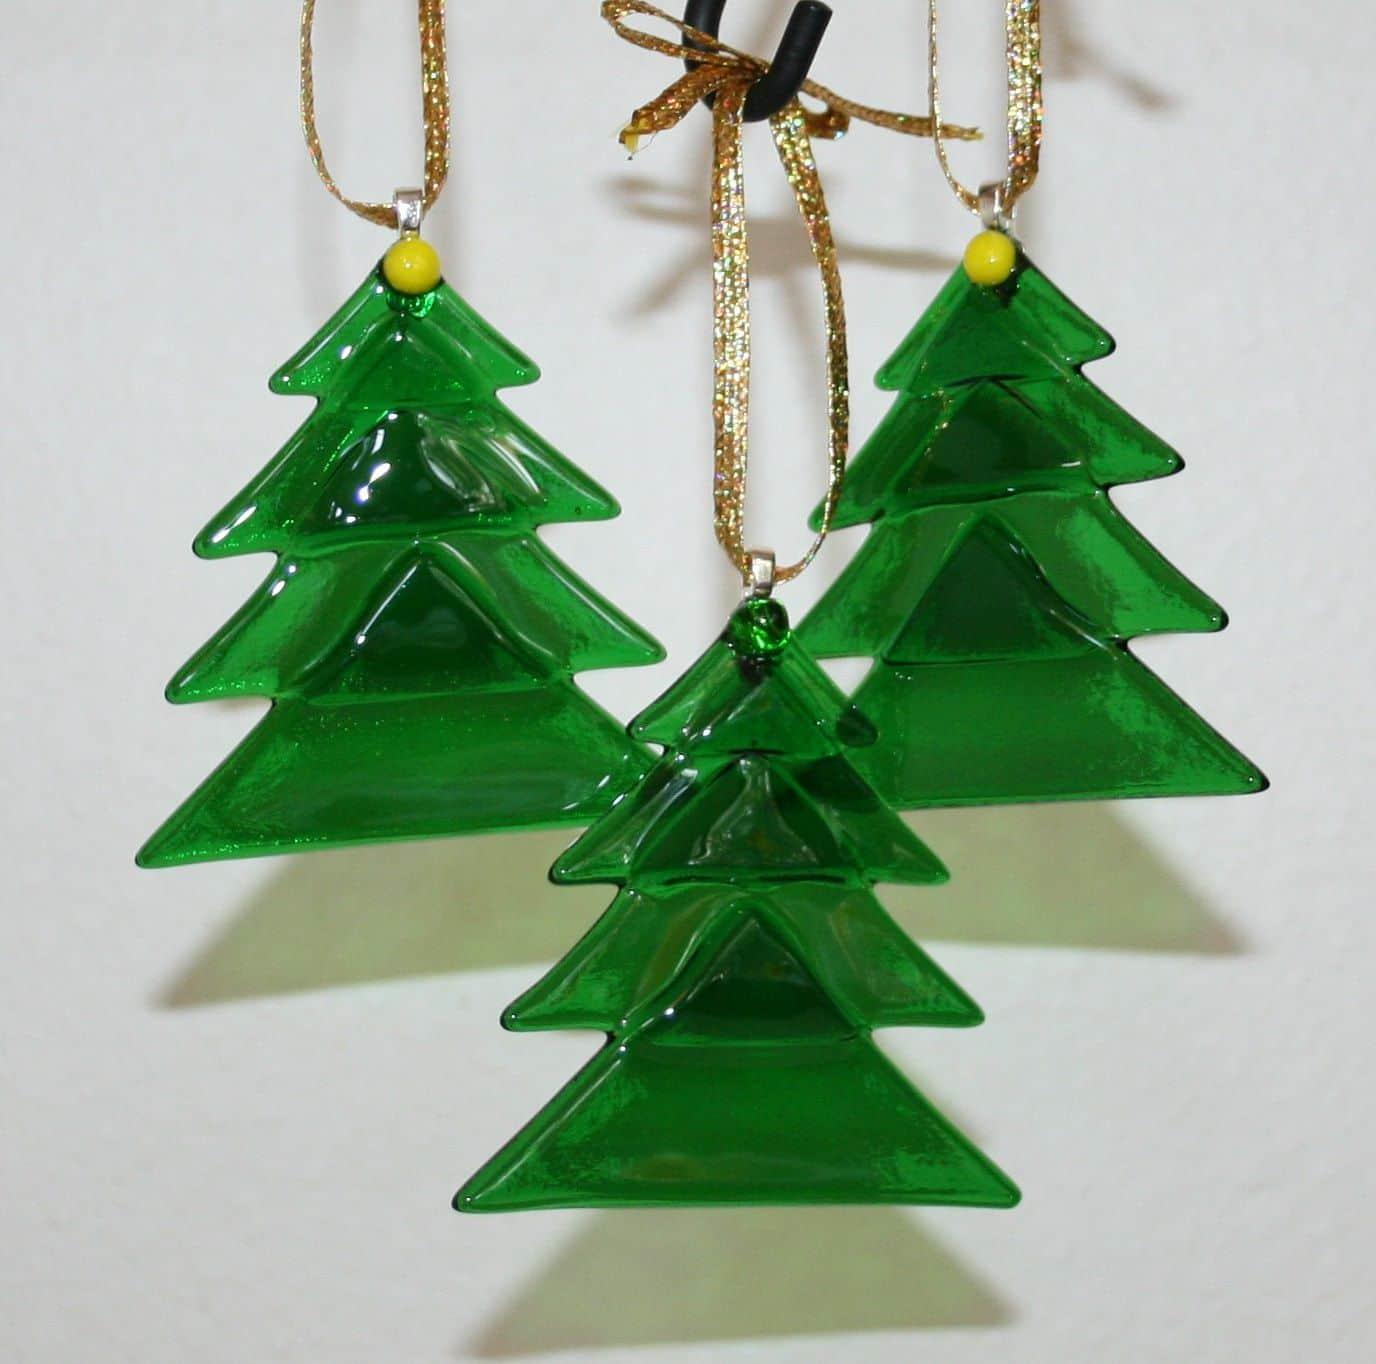 Layered 'glass' Christmas tree ornaments